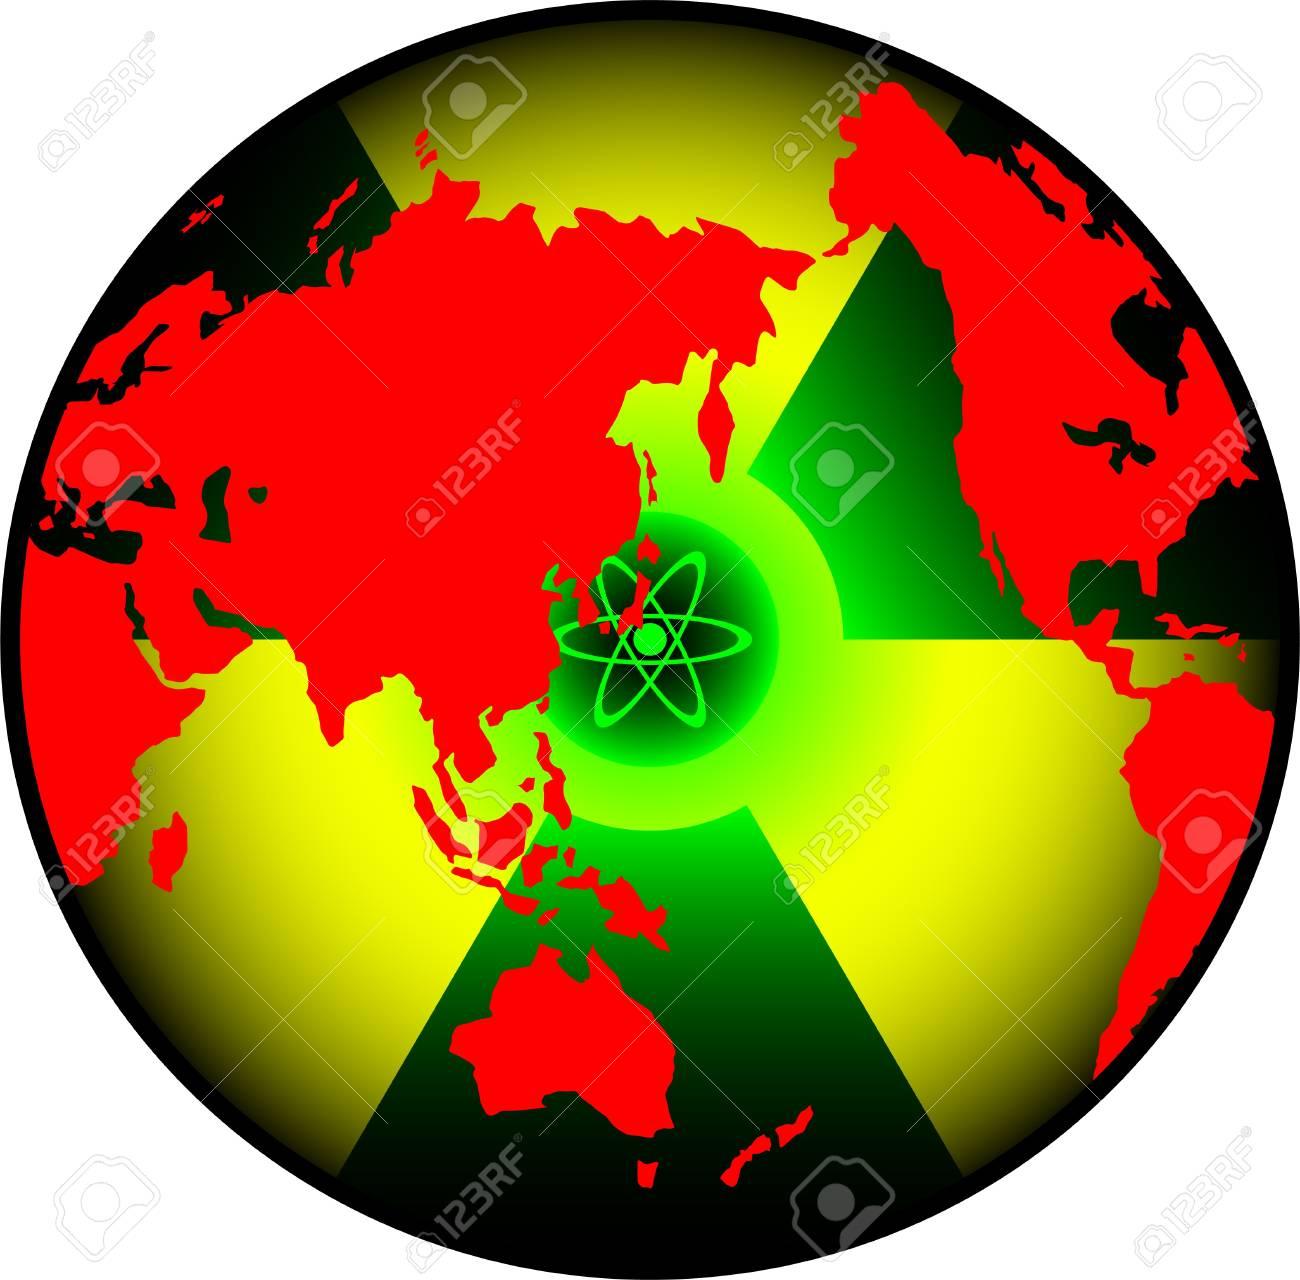 radiation world. vector illustration for design Stock Vector - 9177578